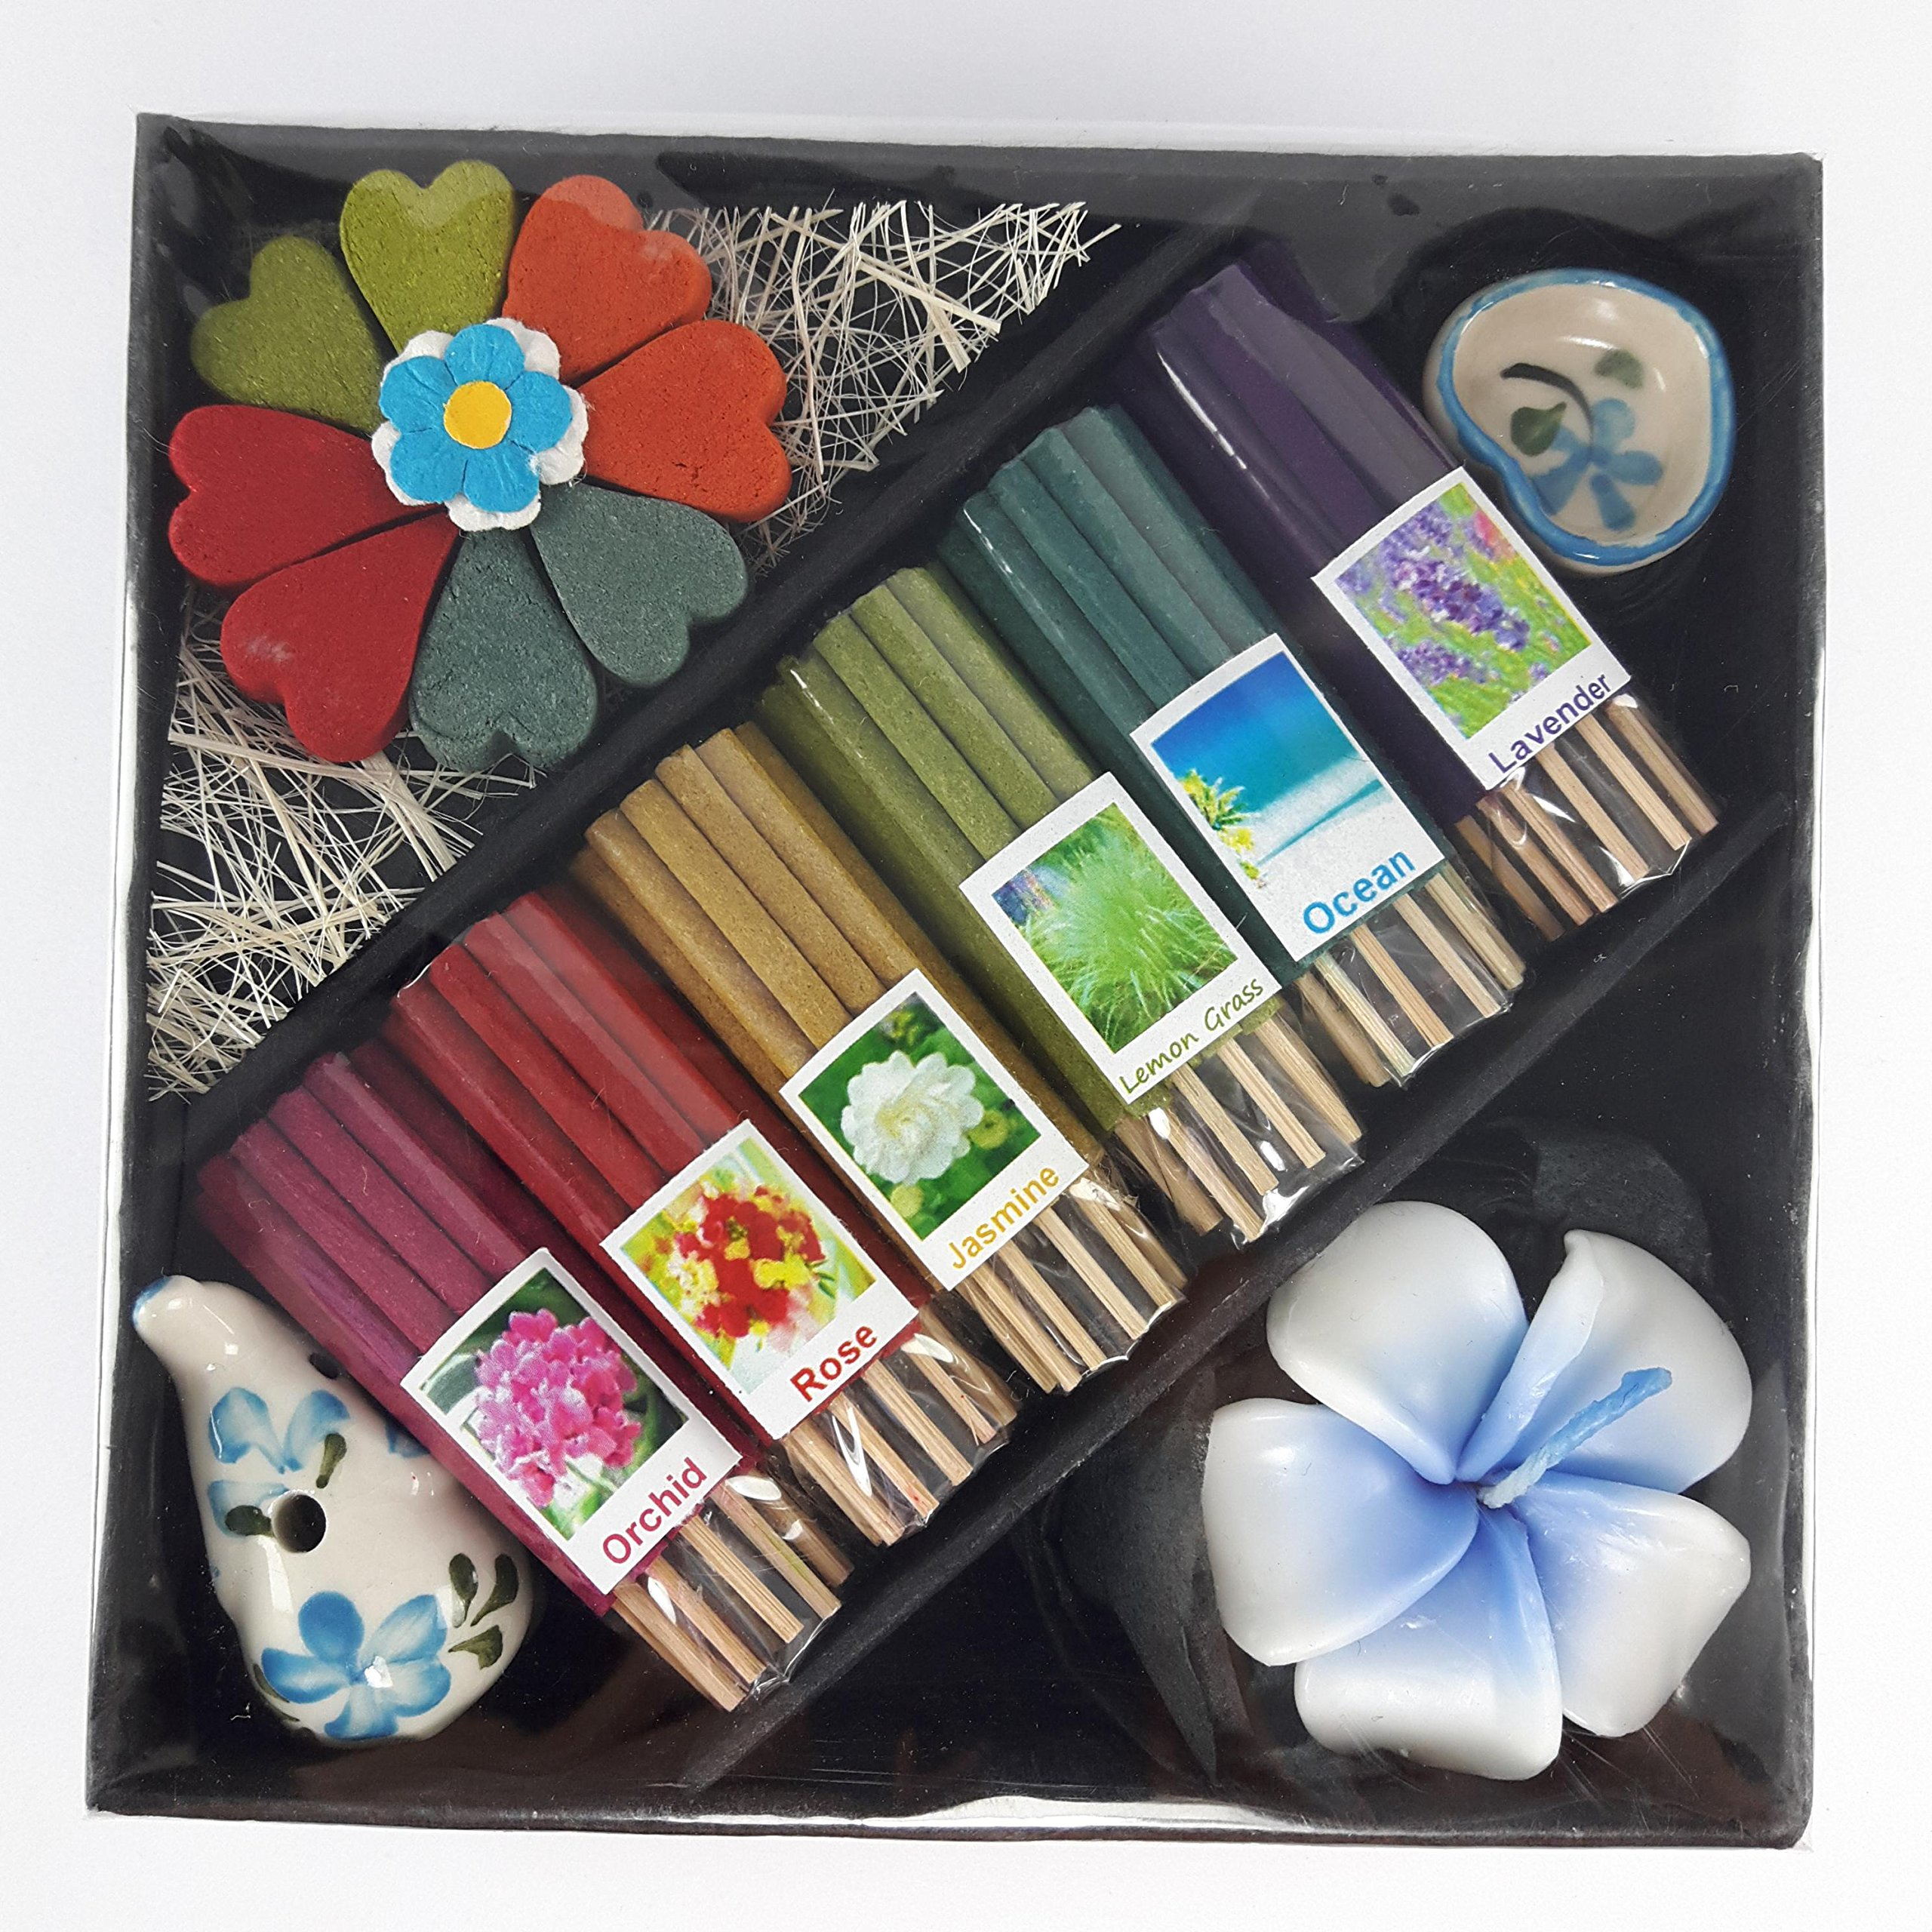 kornkorn87 Thai Mix 6 Scent Relax Sticks Incense Spa Aroma Fragrance Cones Burner Ceramic Holder